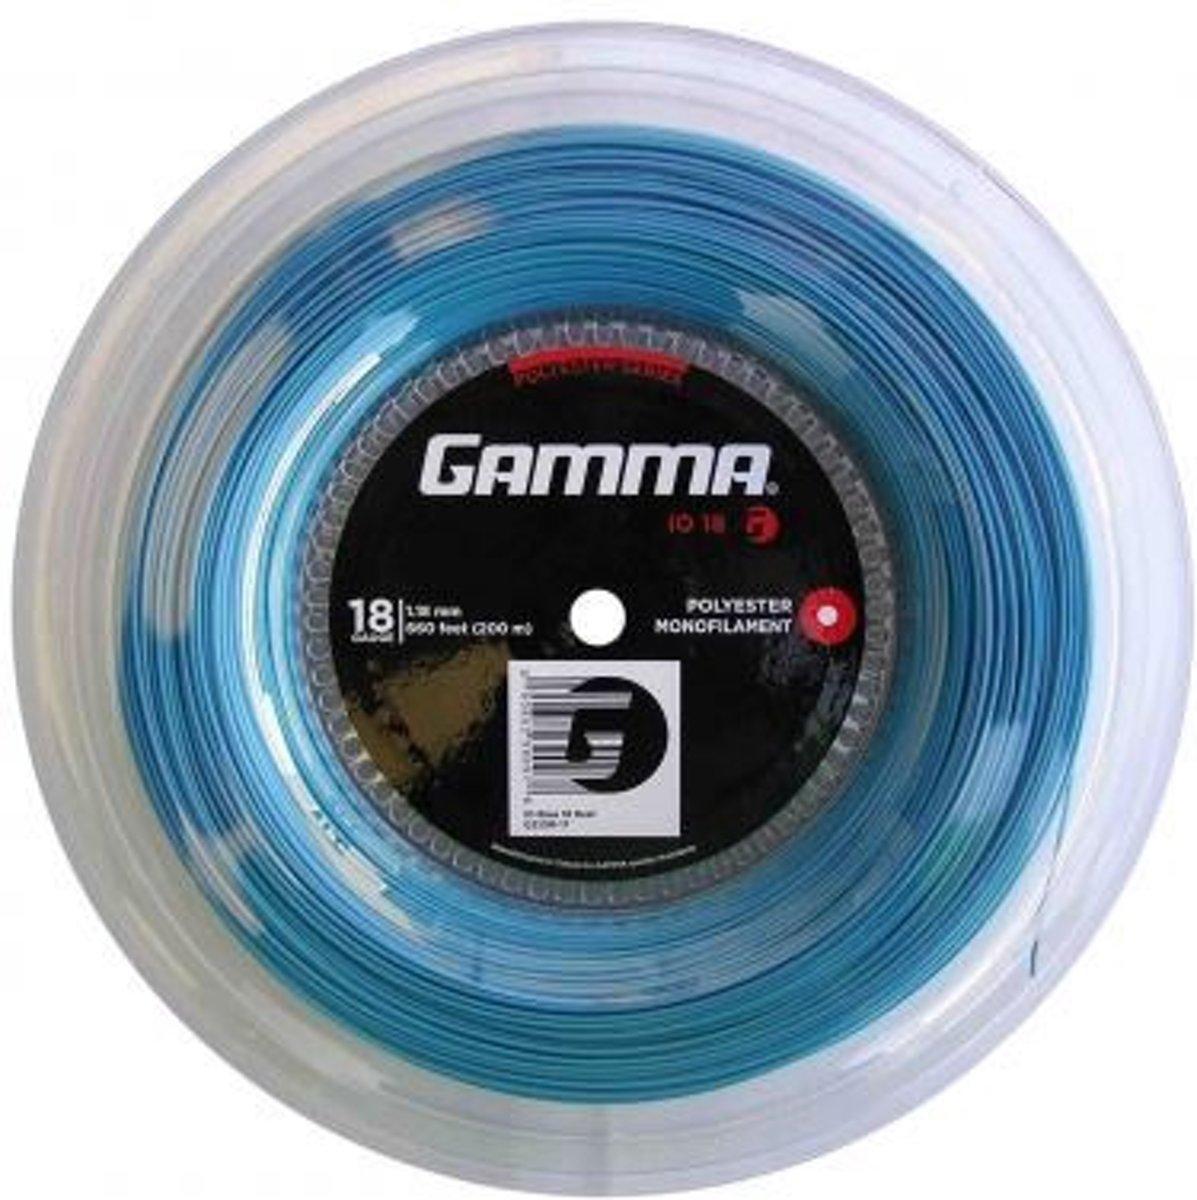 Gamma iO 18 Blue kopen